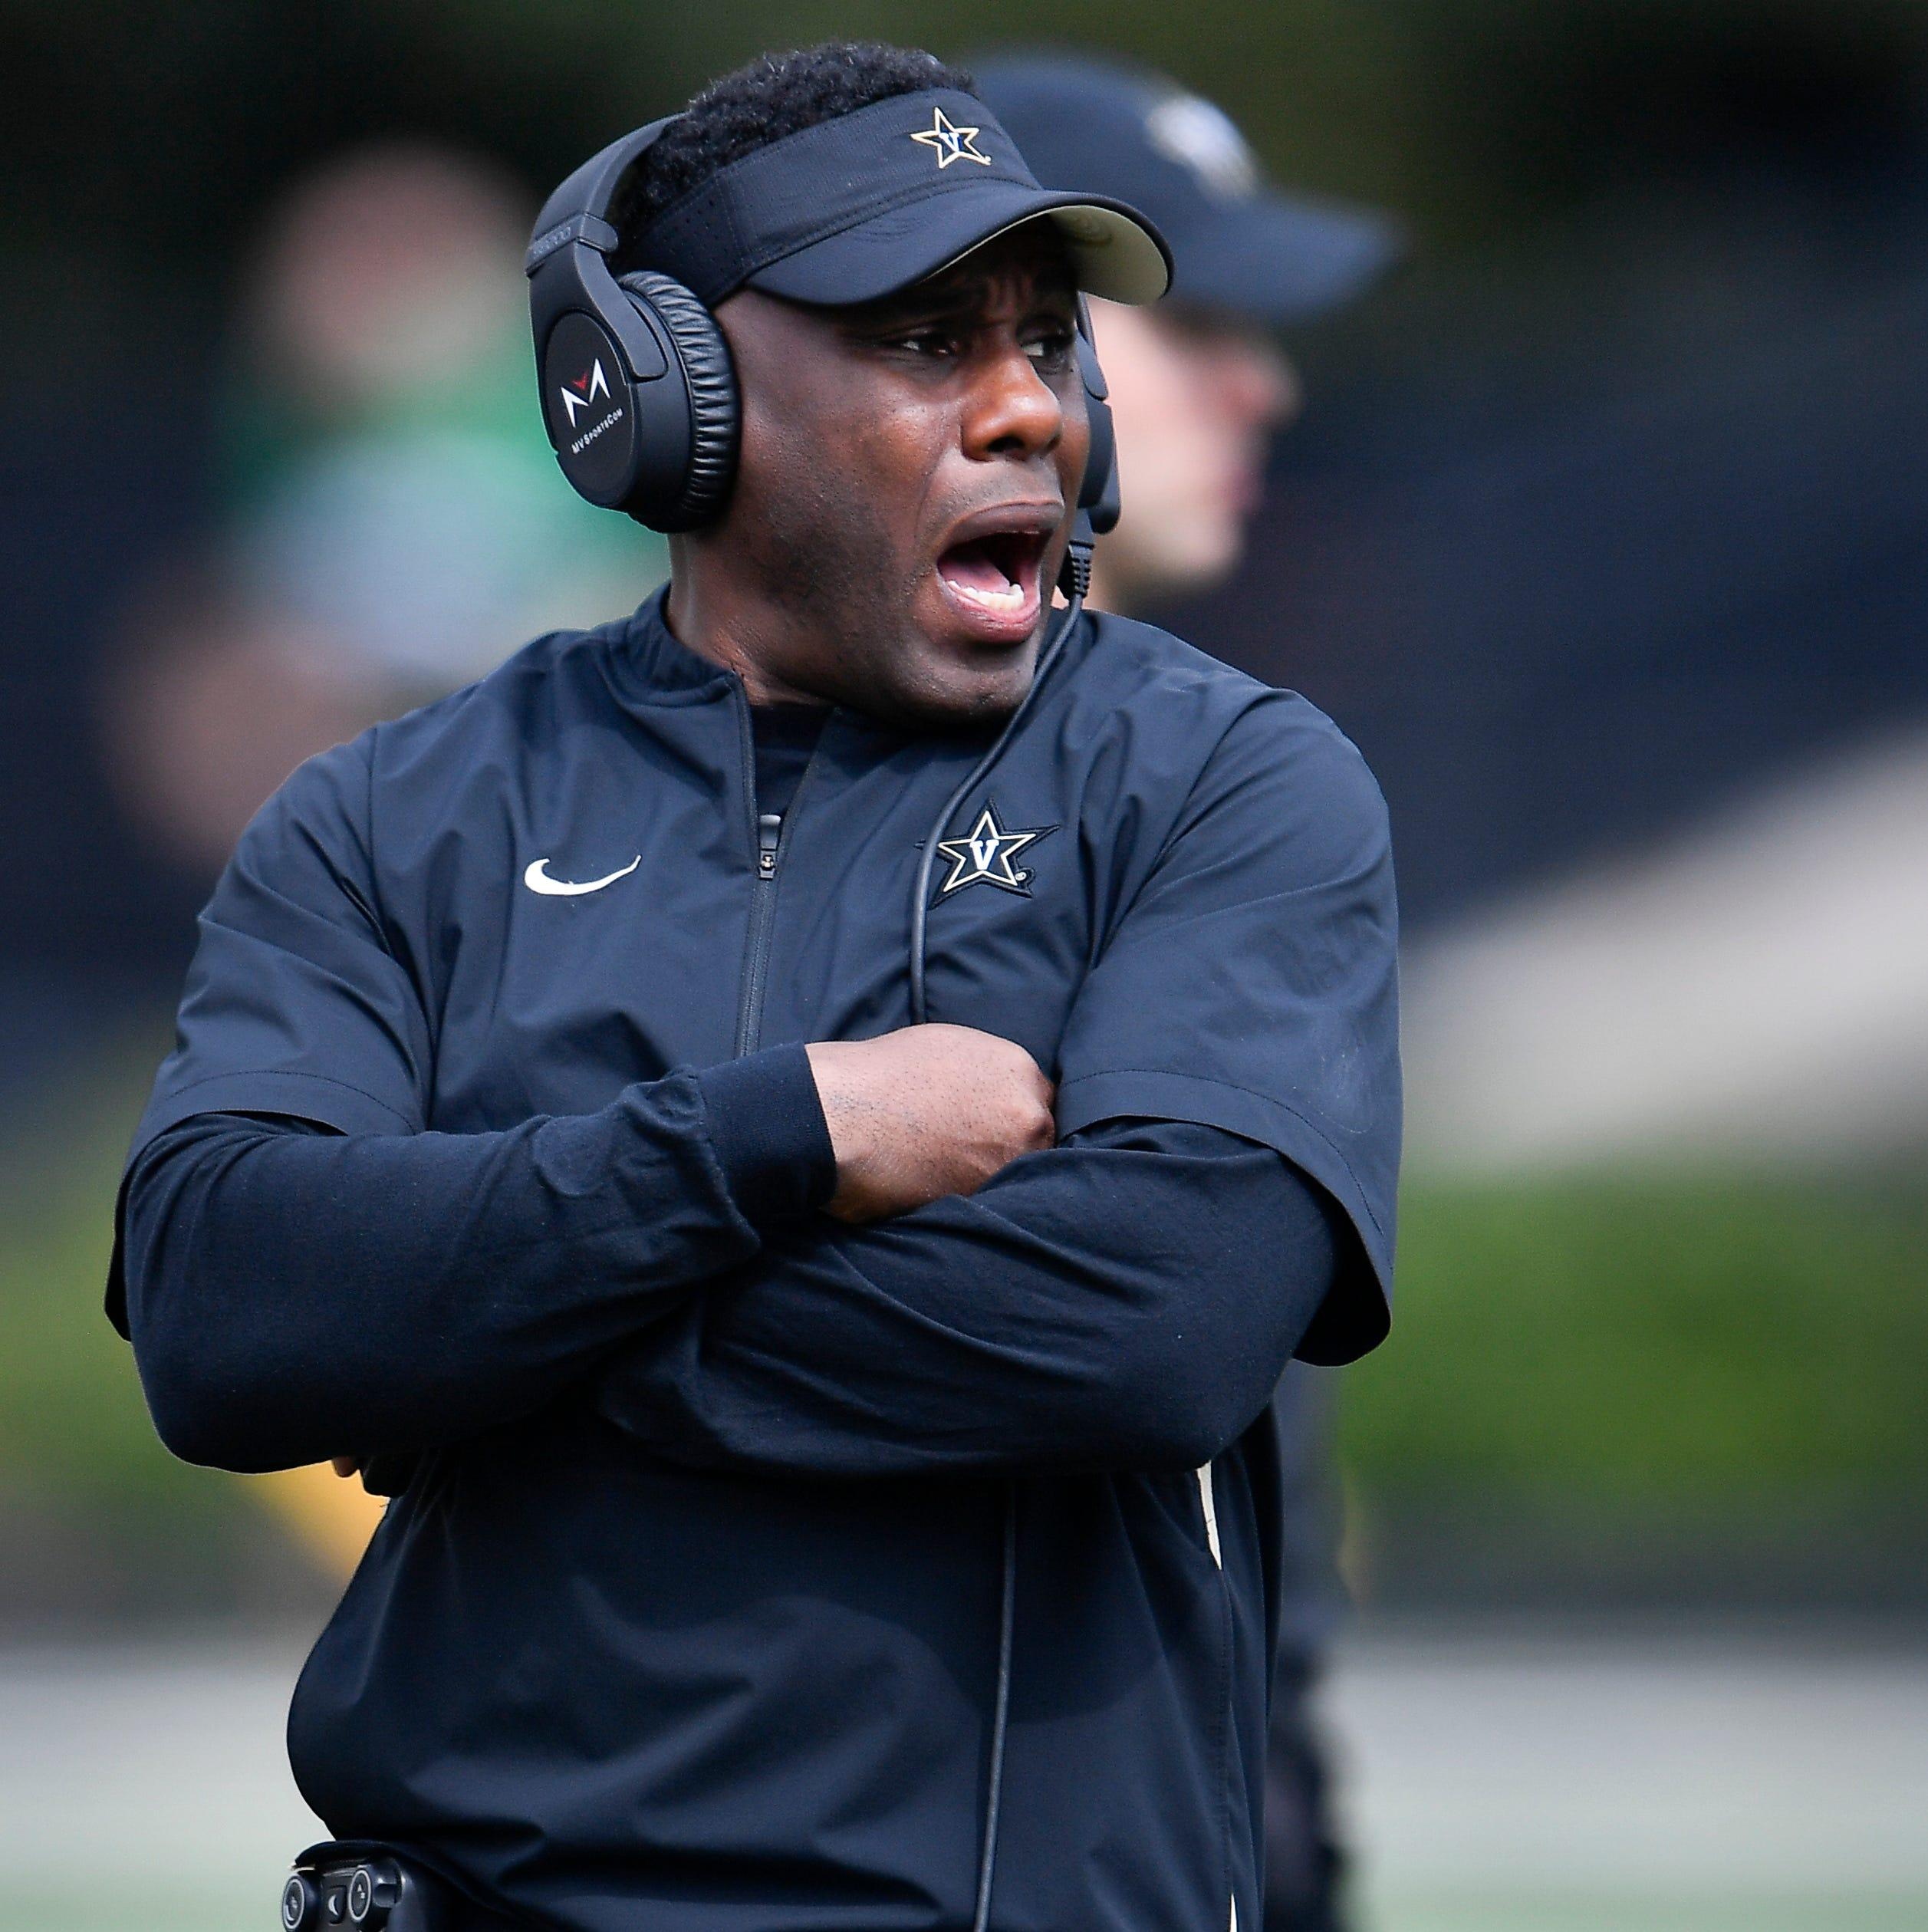 Vanderbilt football: Former player Jovan Haye among two new assistant coaches